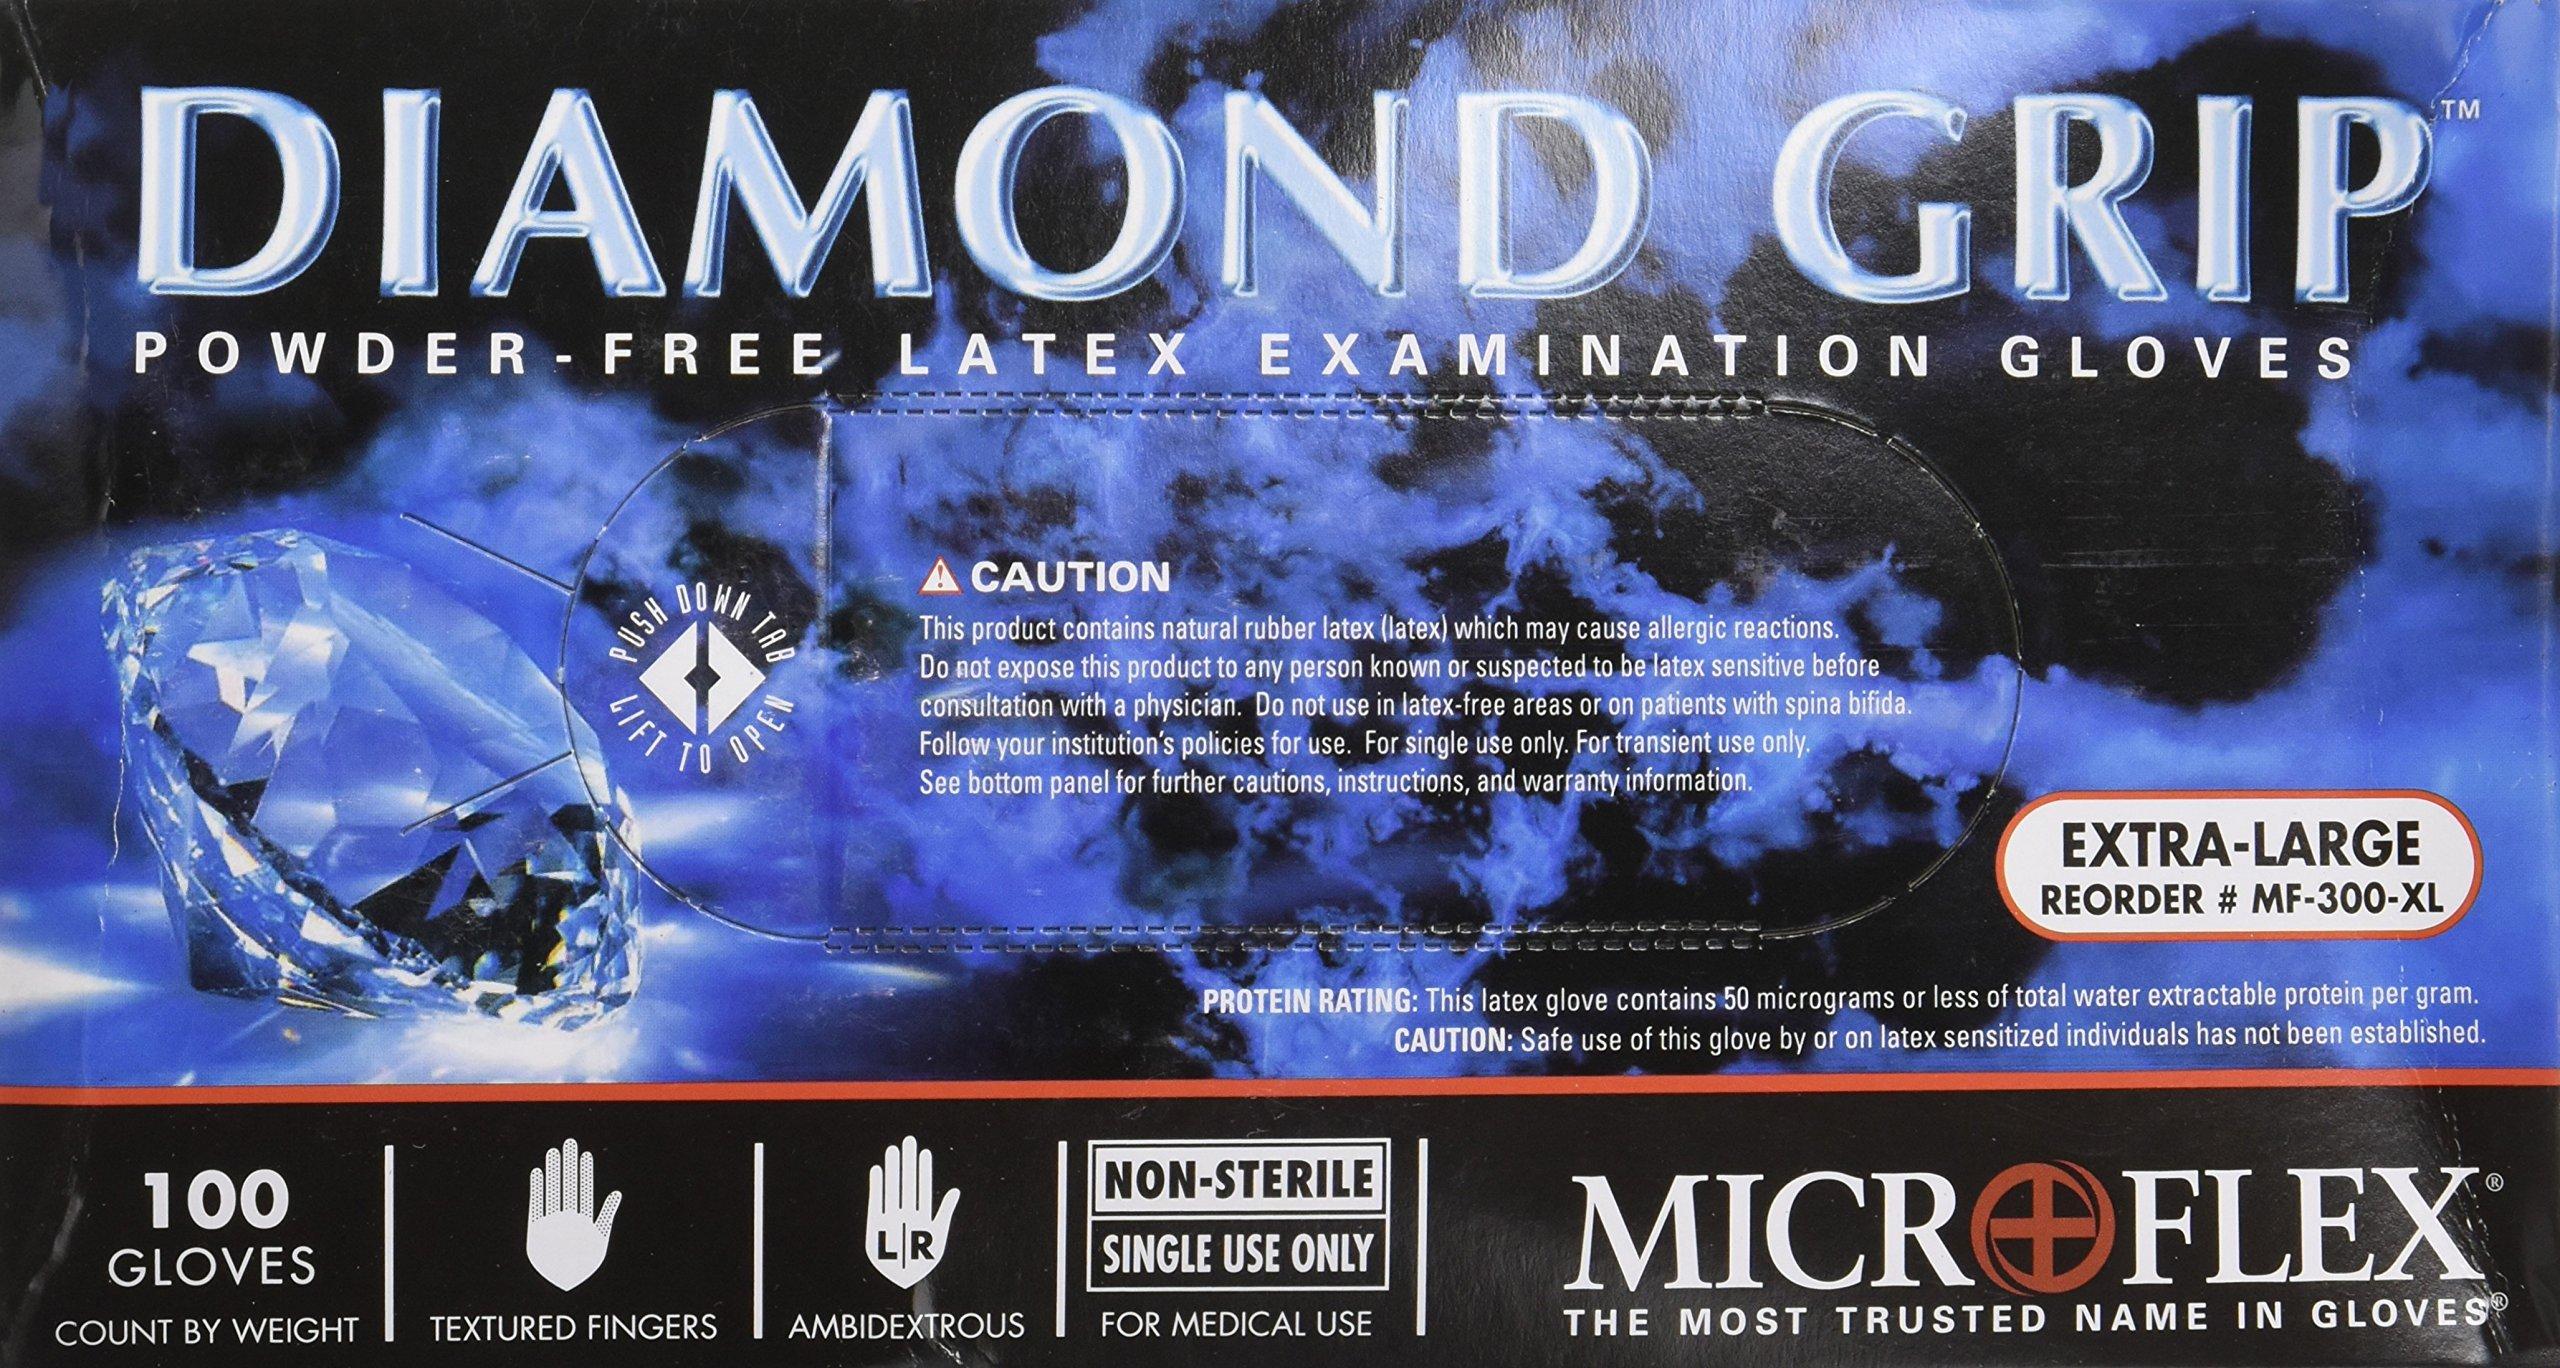 Microflex MF300XL-10PK - Diamond Grip Powder-Free Latex Gloves - Case Of 10 B... by Microflex (Image #1)